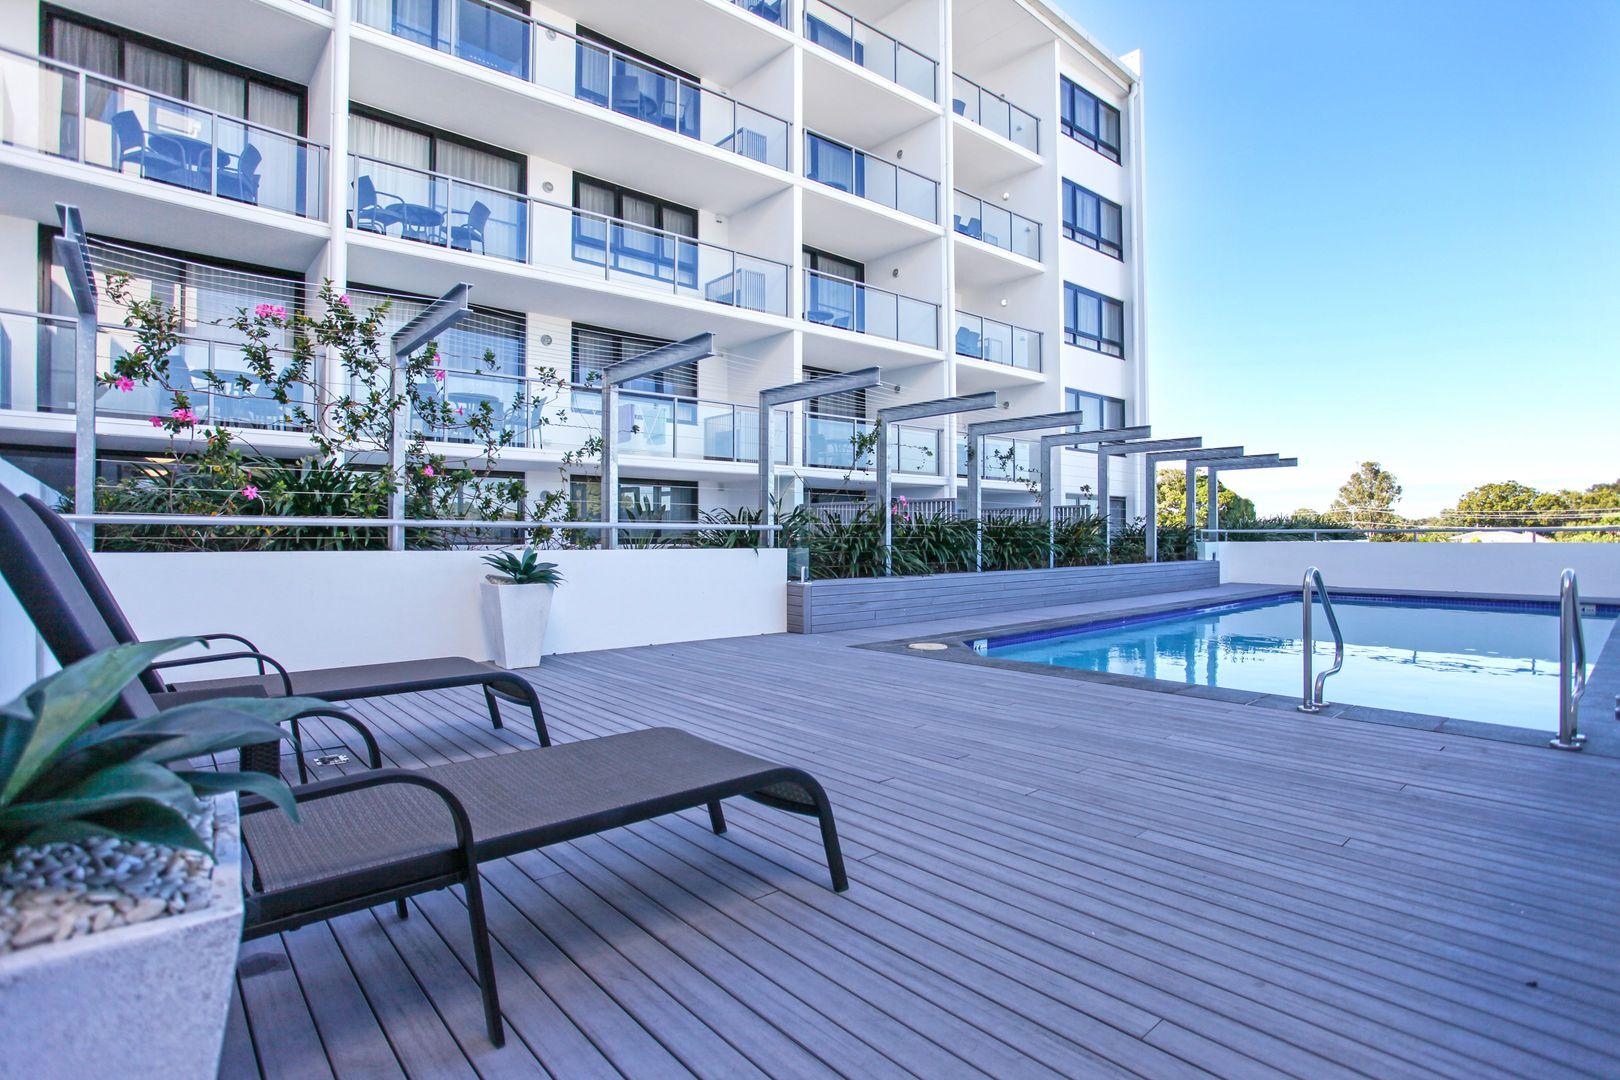 42/23 Alfred Street, Mackay QLD 4740, Image 1